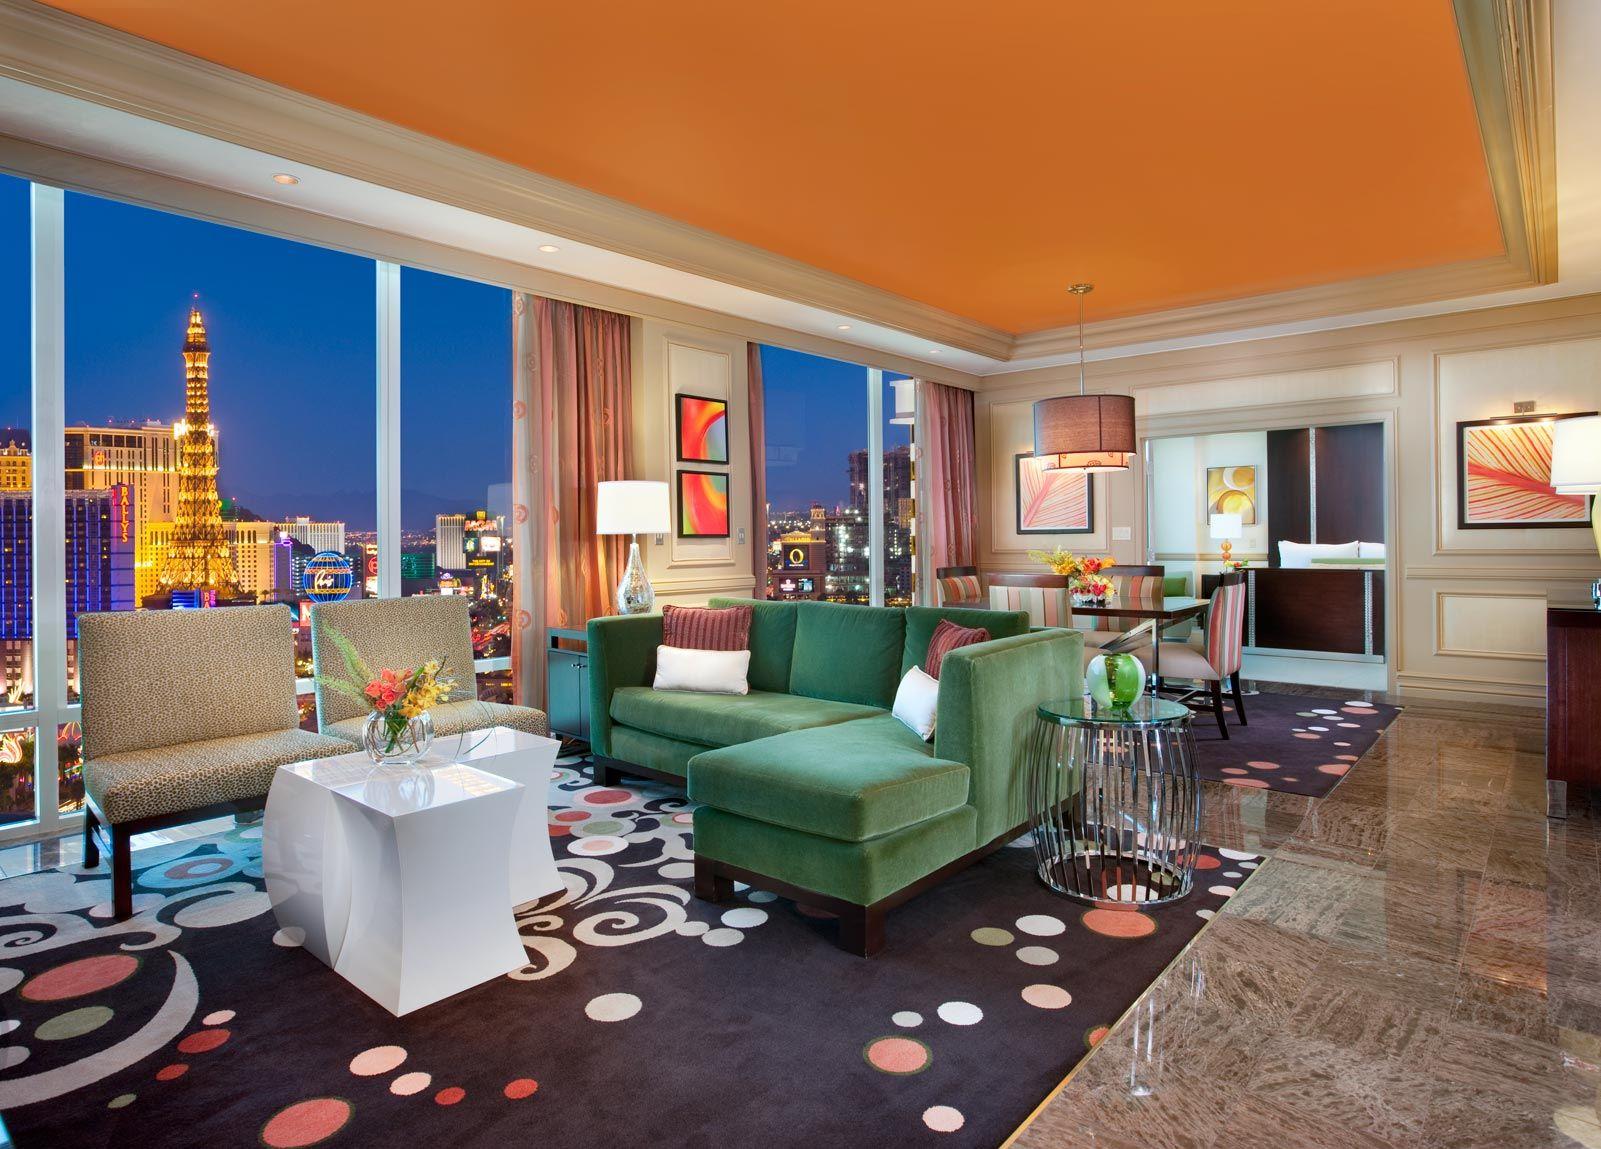 Las Vegas 2 Bedroom Suite Deals 2 Bedroom Suite In Las Vegas Strip View Bedroom Premier Suite